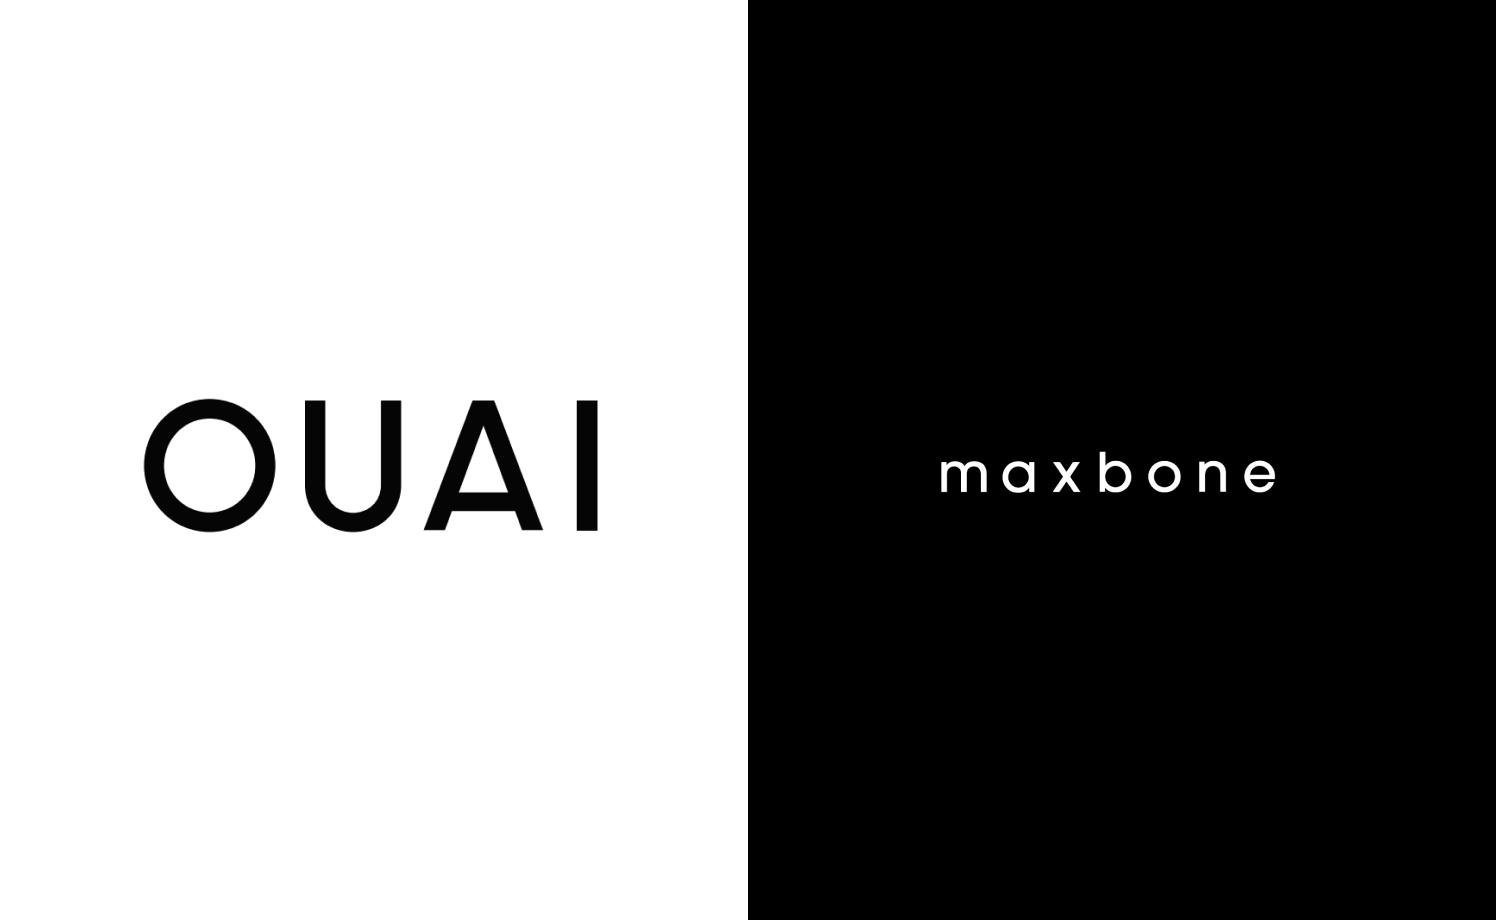 feedback-friday-ouai-maxbone